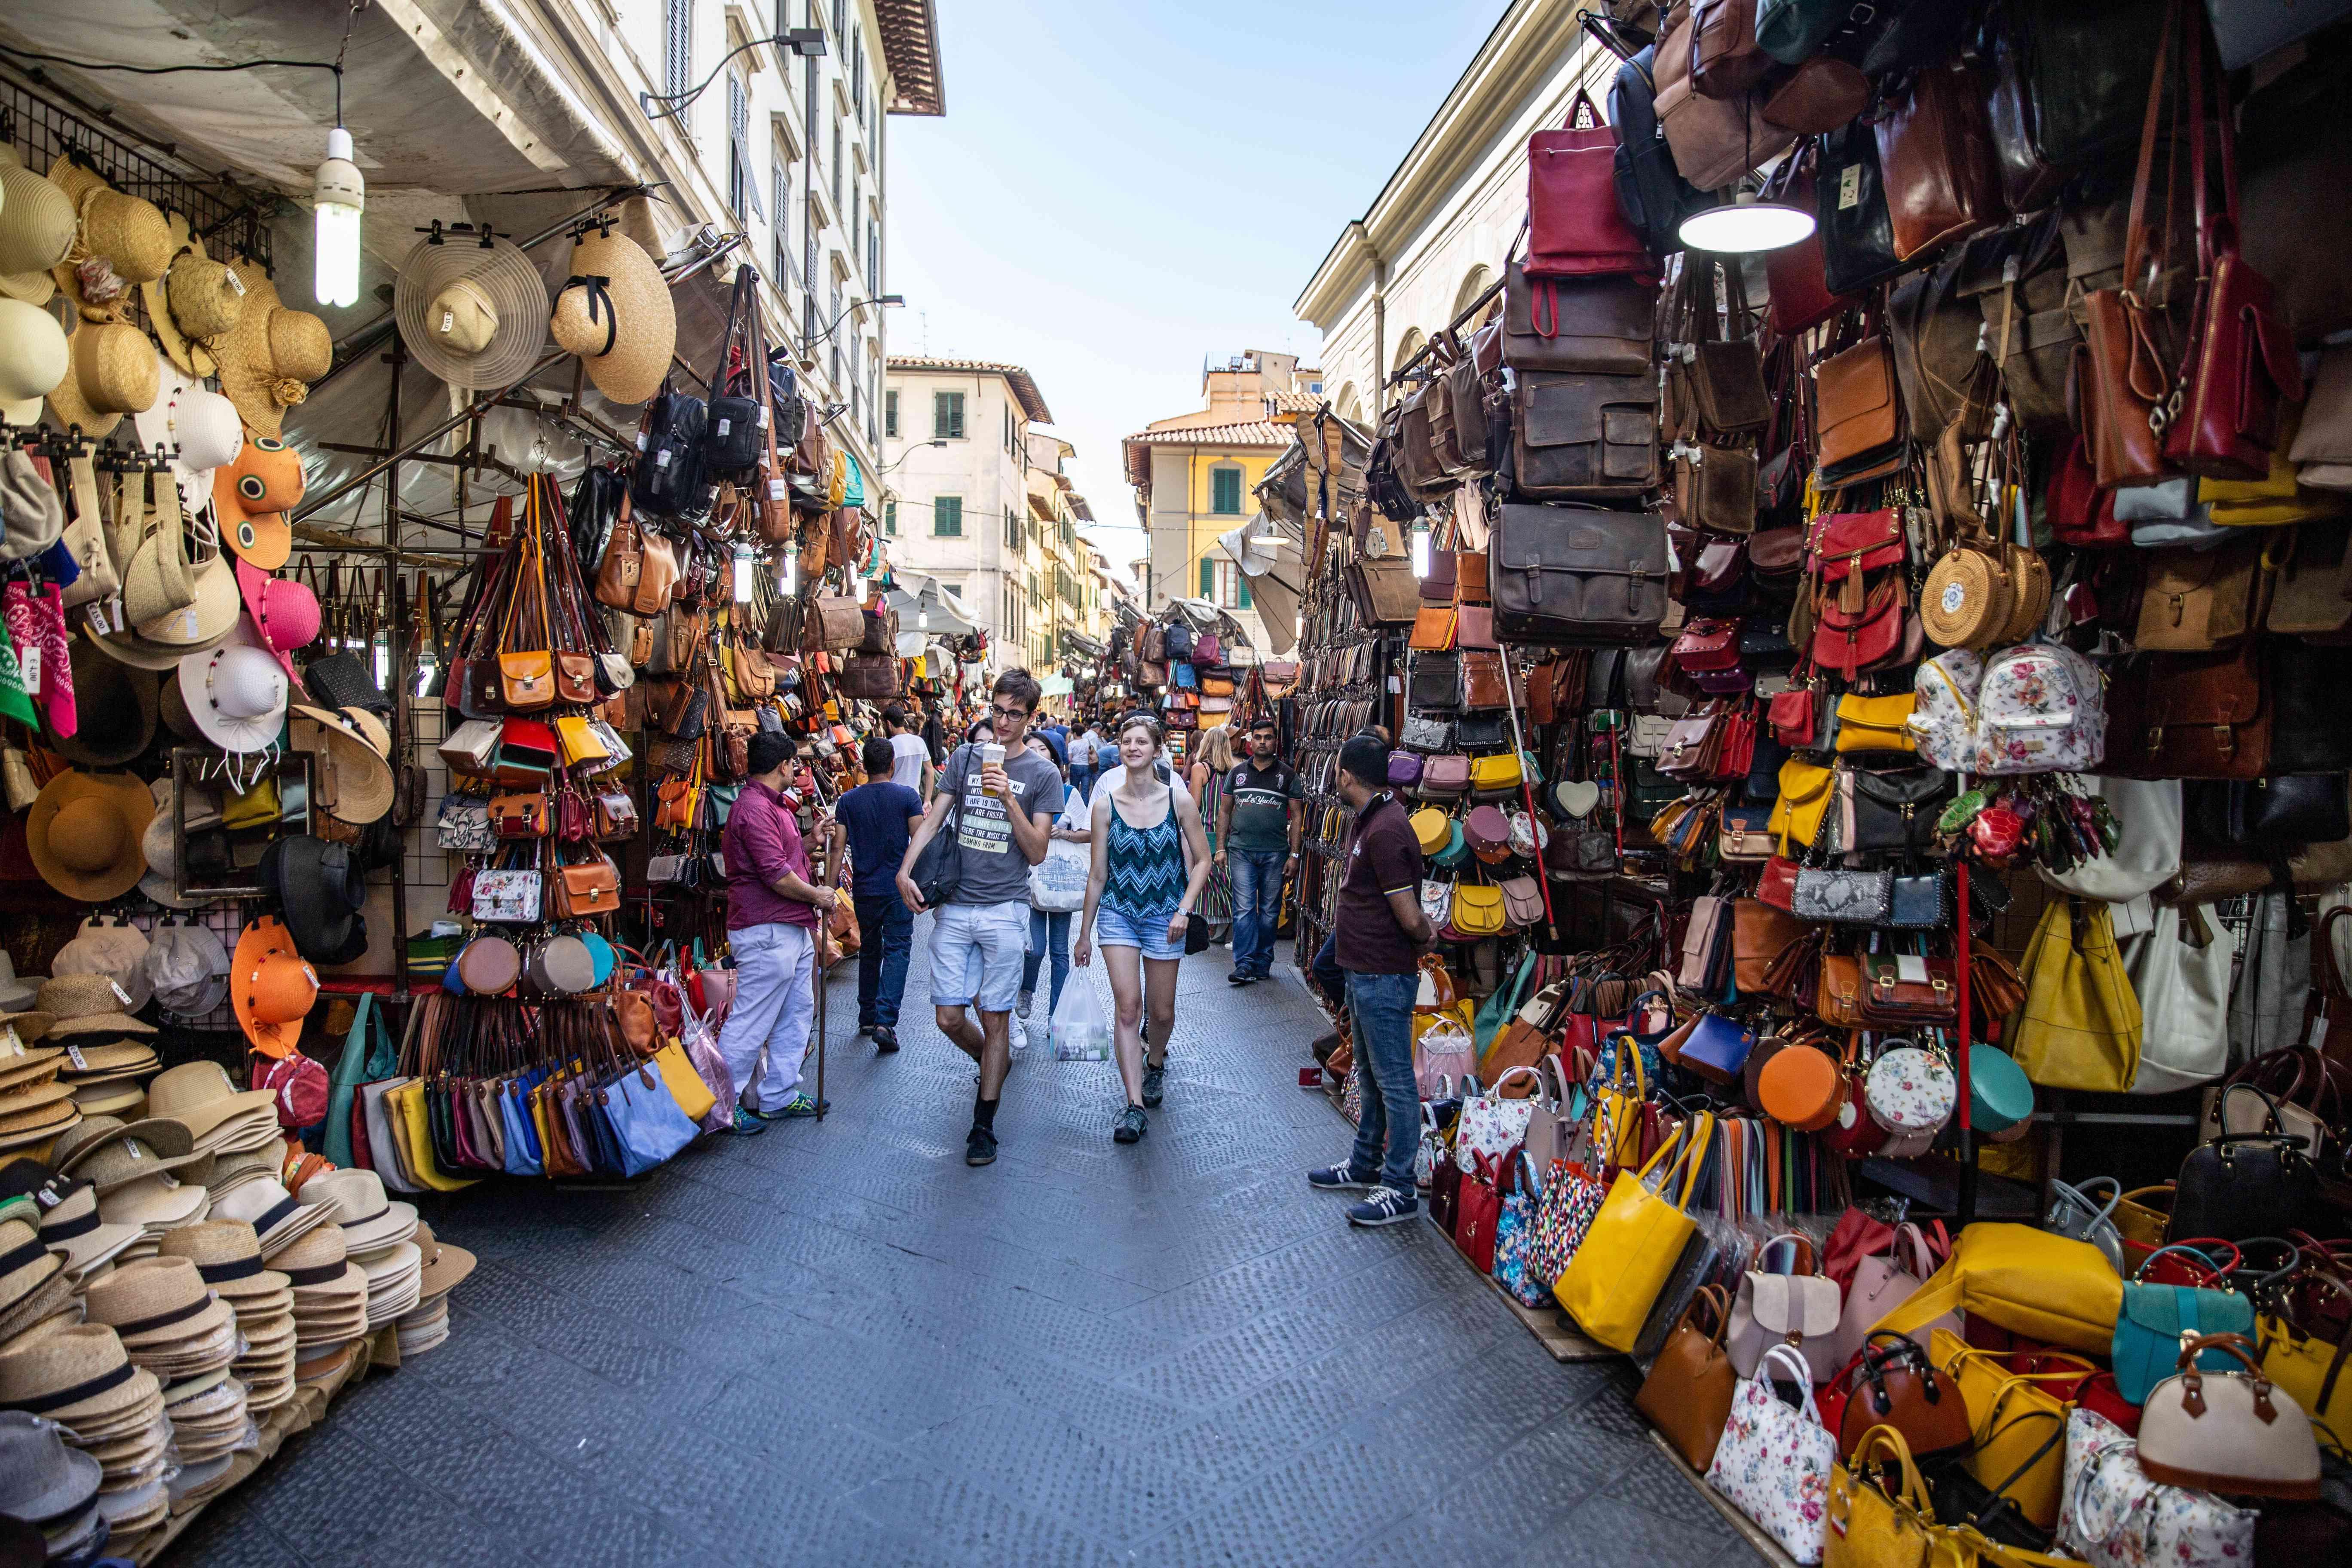 San Lorenzo Market in Florence, Italy